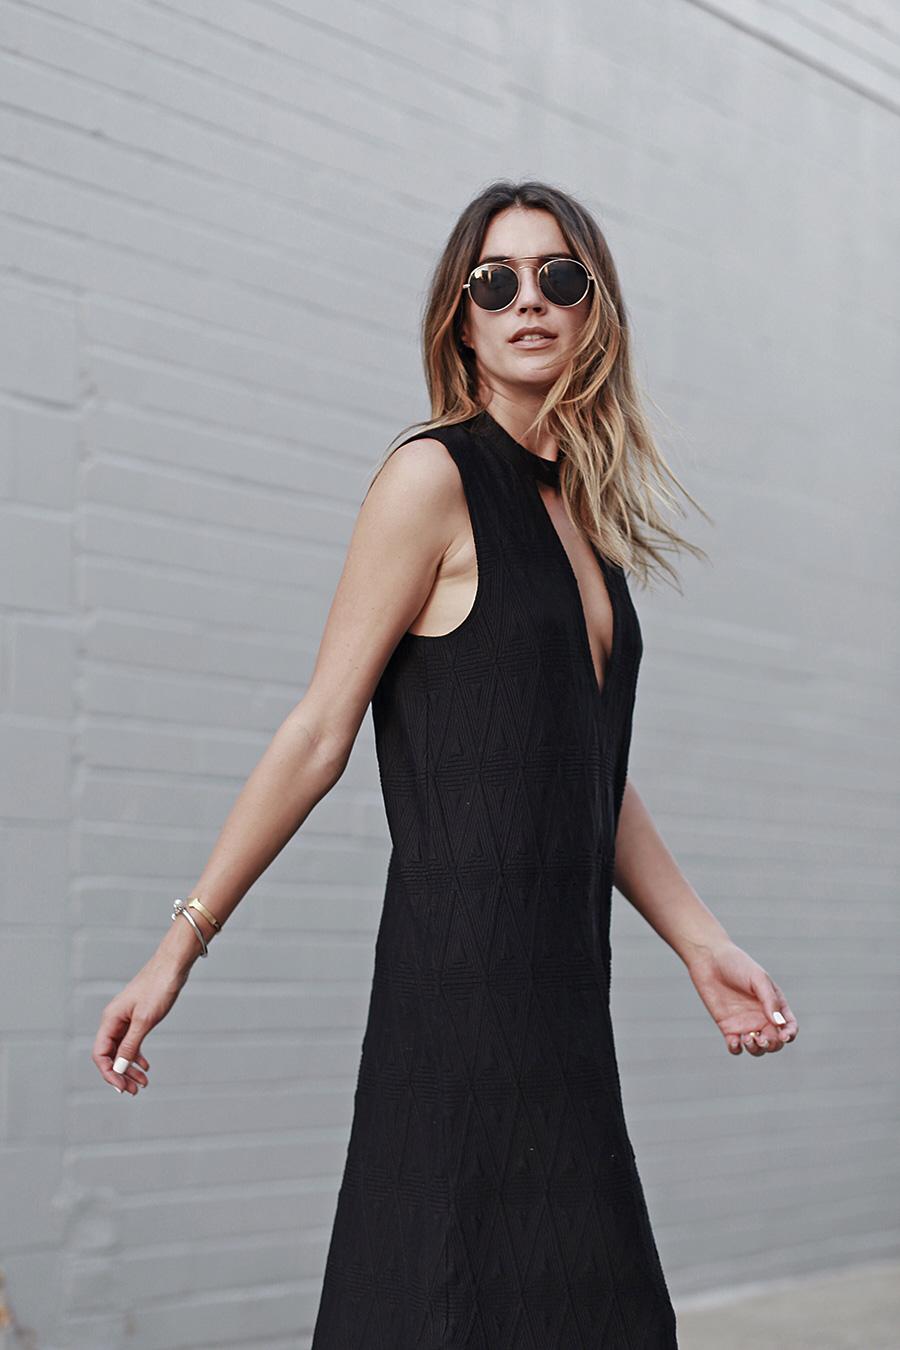 Round Sunglasses Little Black Dress Ombre Hair